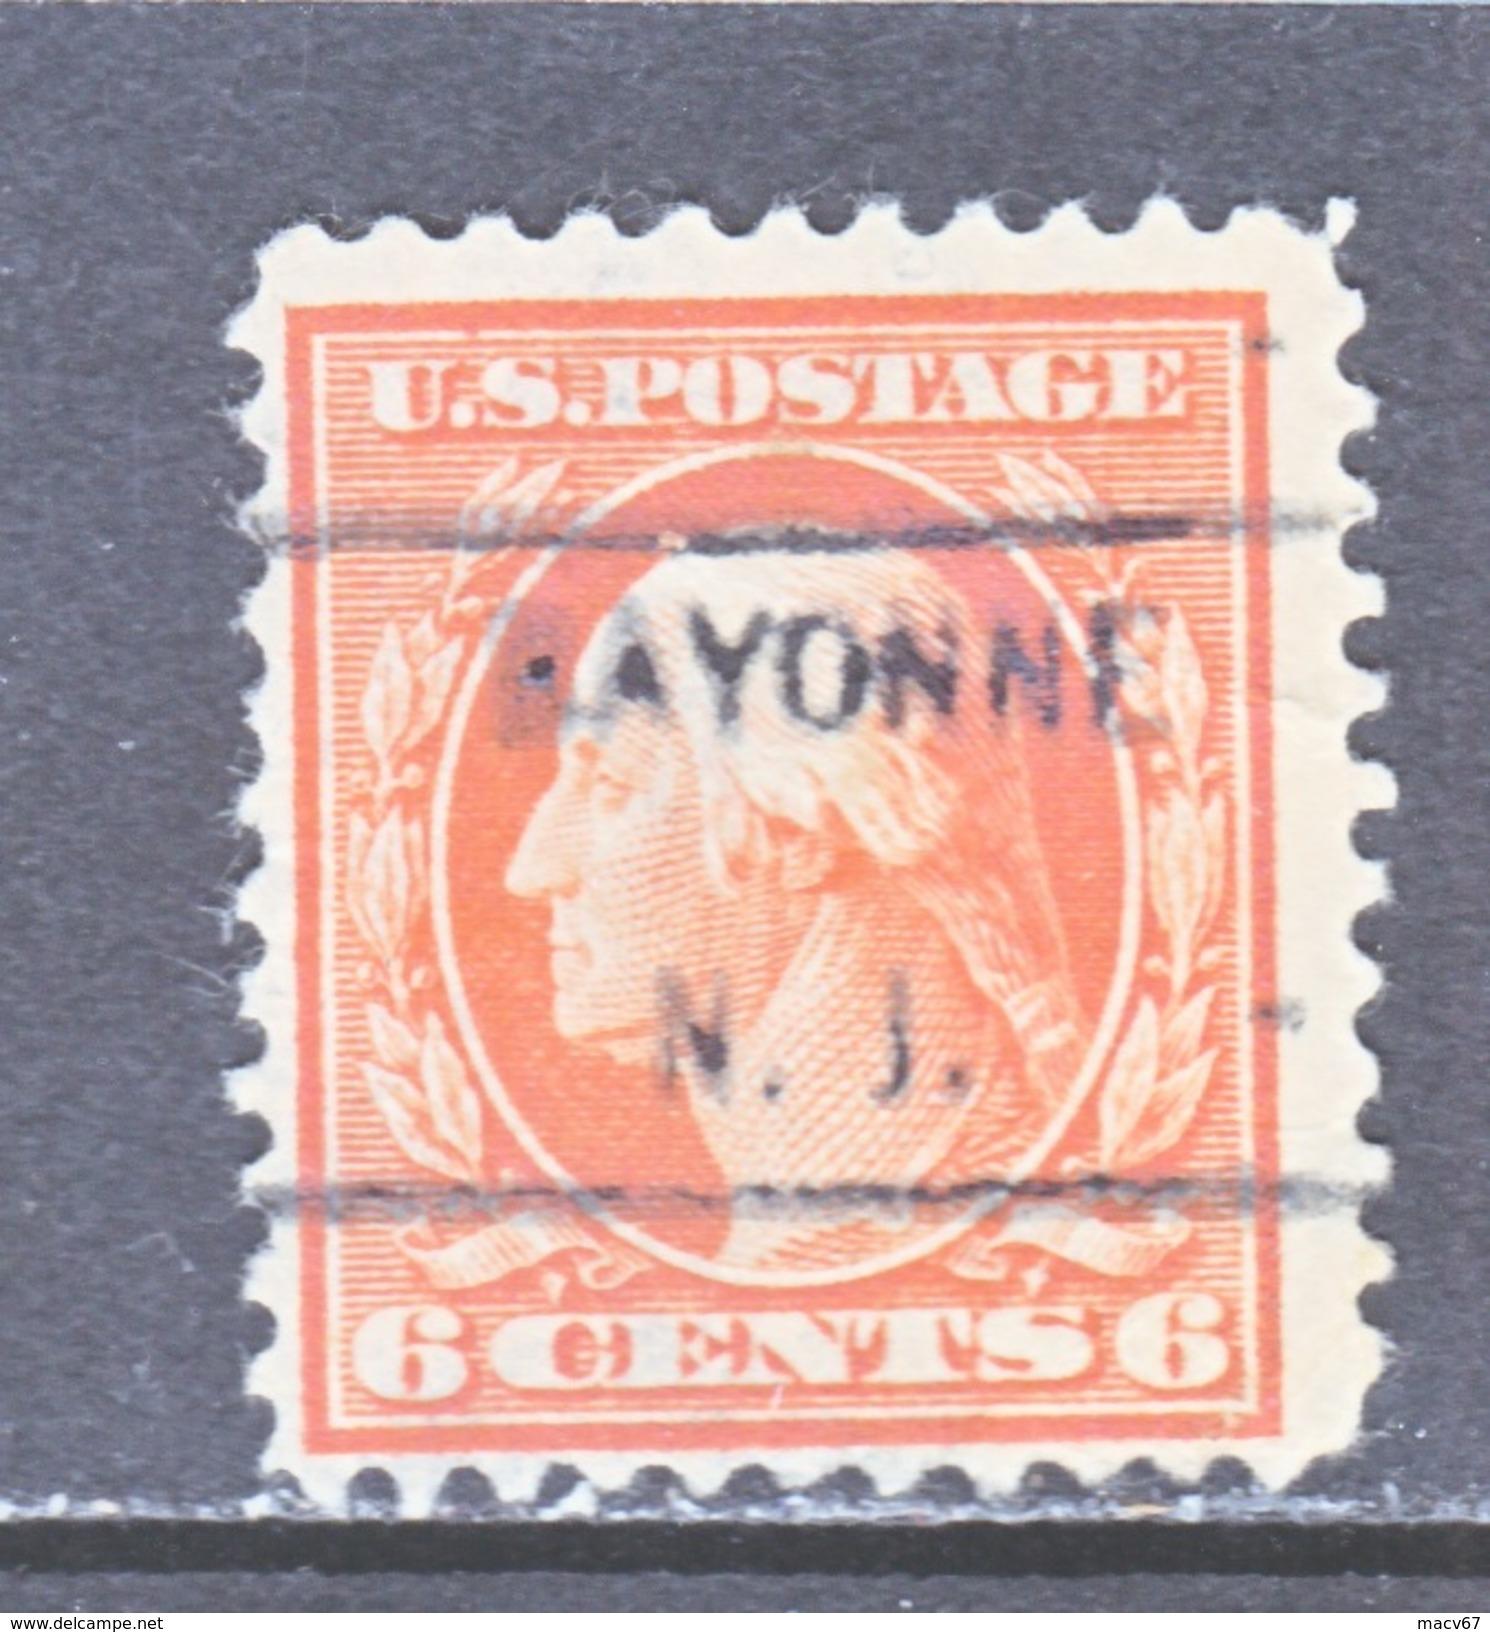 U.S. 506  (o)  N.J. STATE.  FLAT PRESS  NO Wmk. Perf 11  1917-19 Issue - Precancels